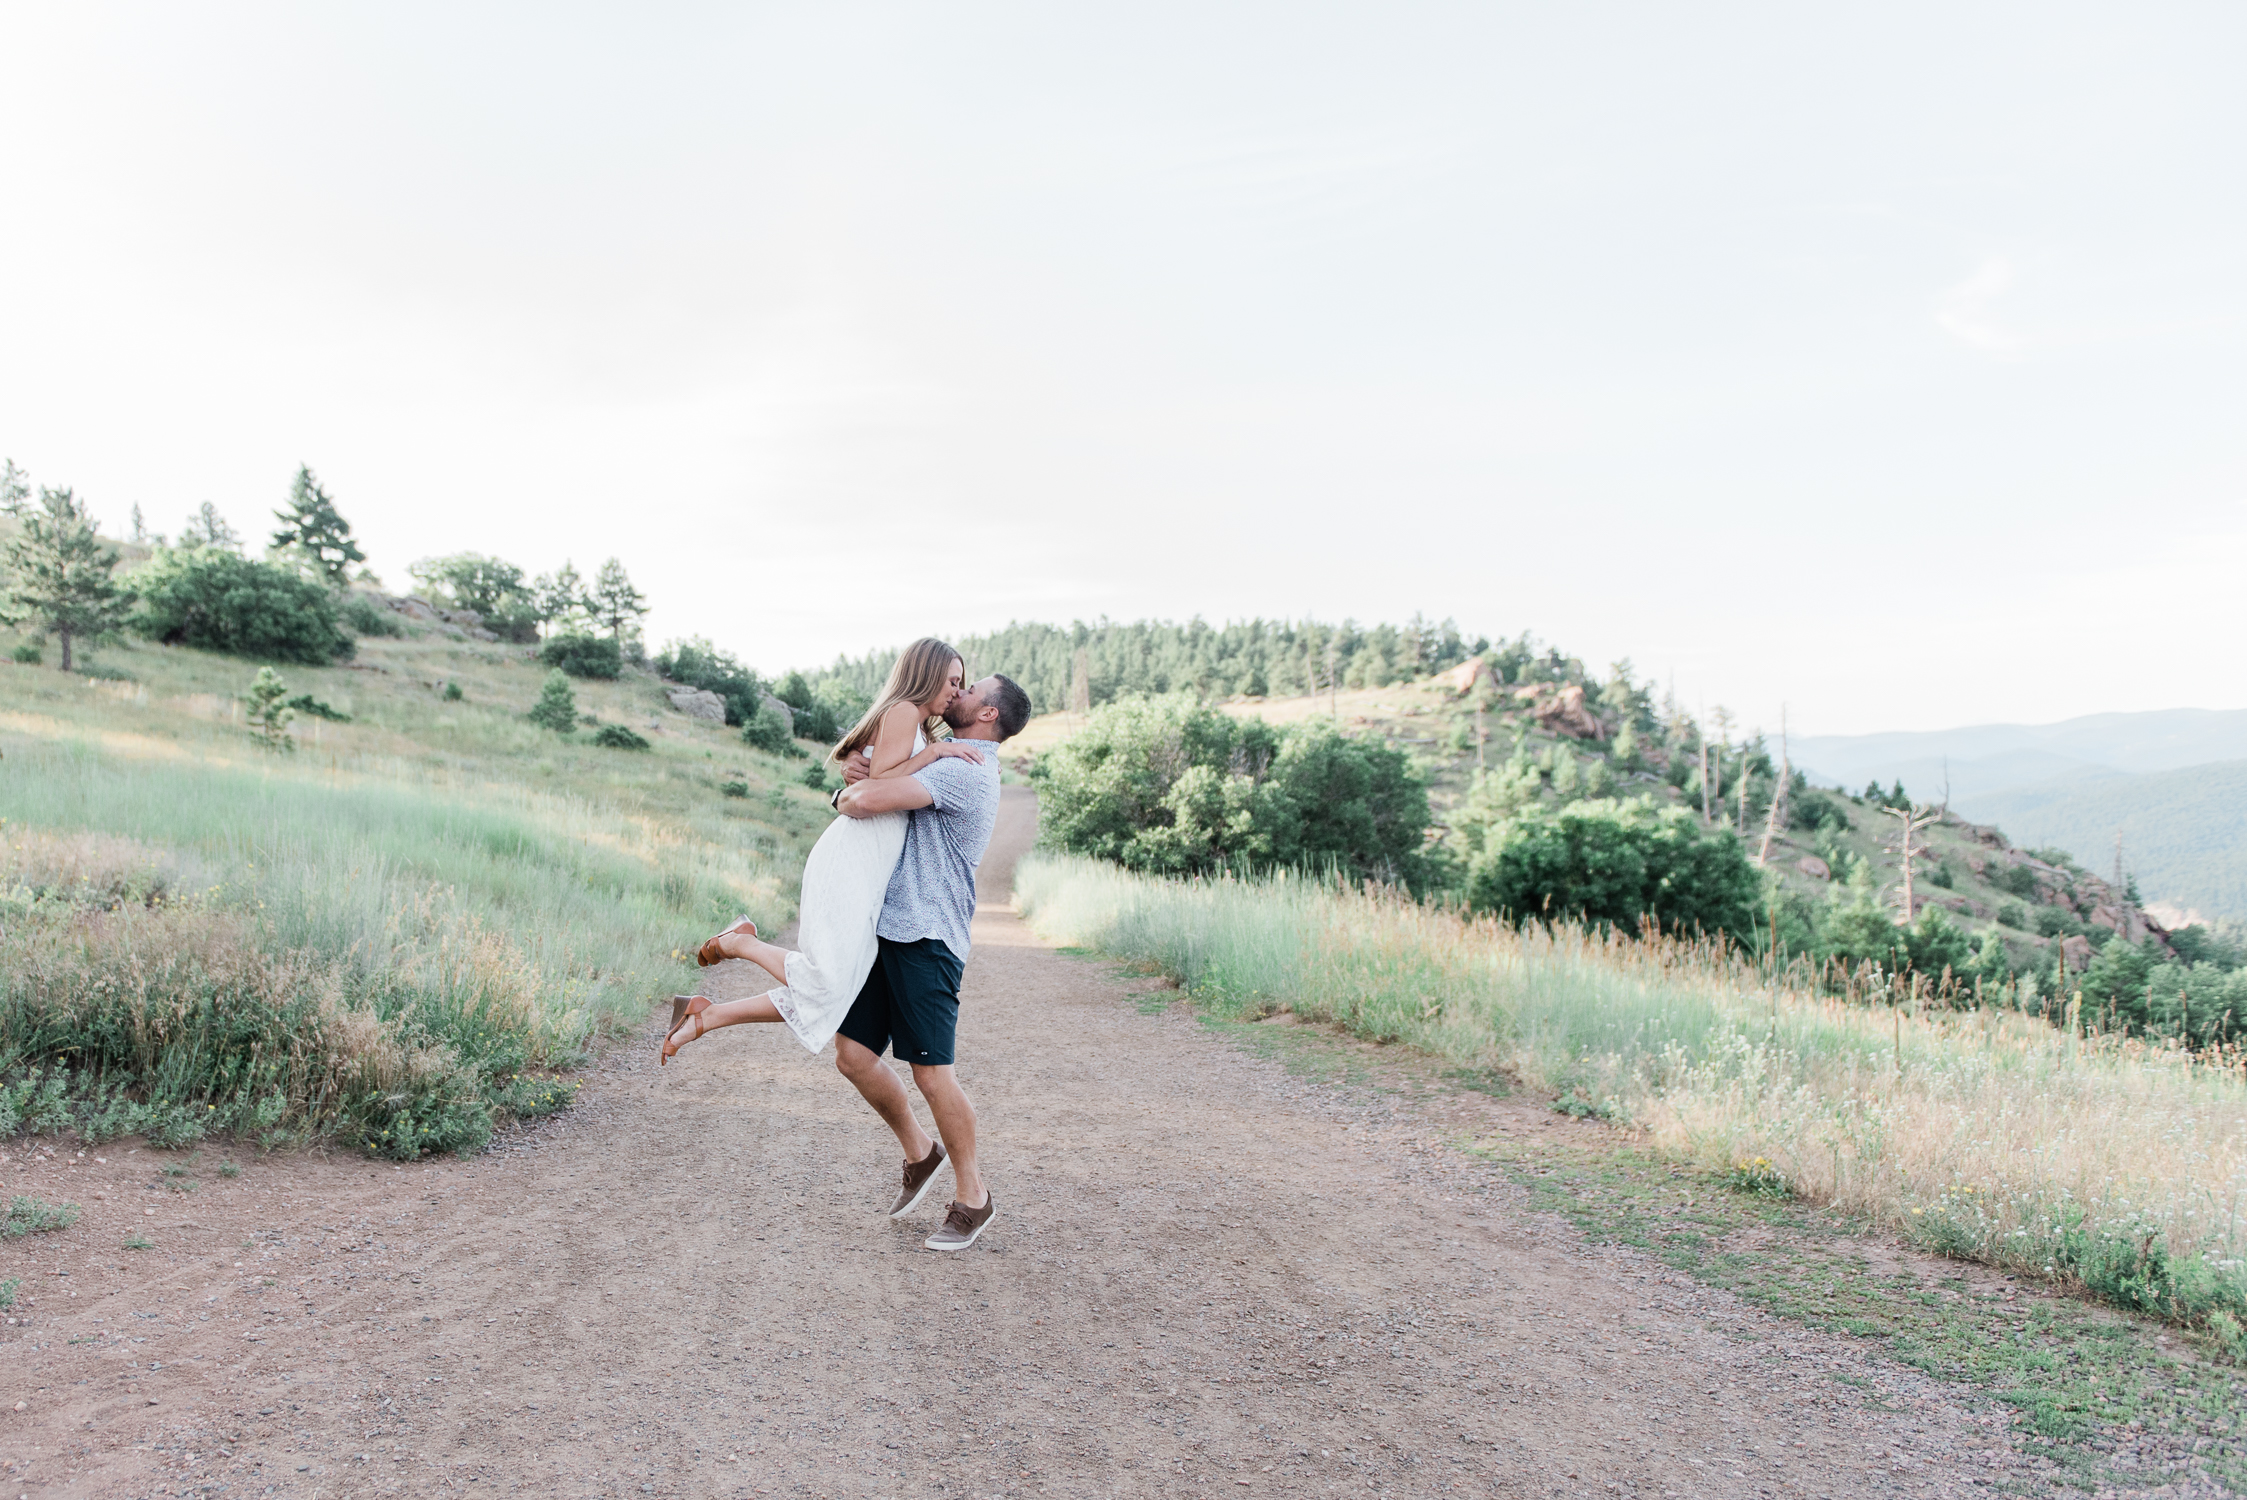 2019-08-30-Engagement-Morgan-Adam-MtFalcon-1843.jpg